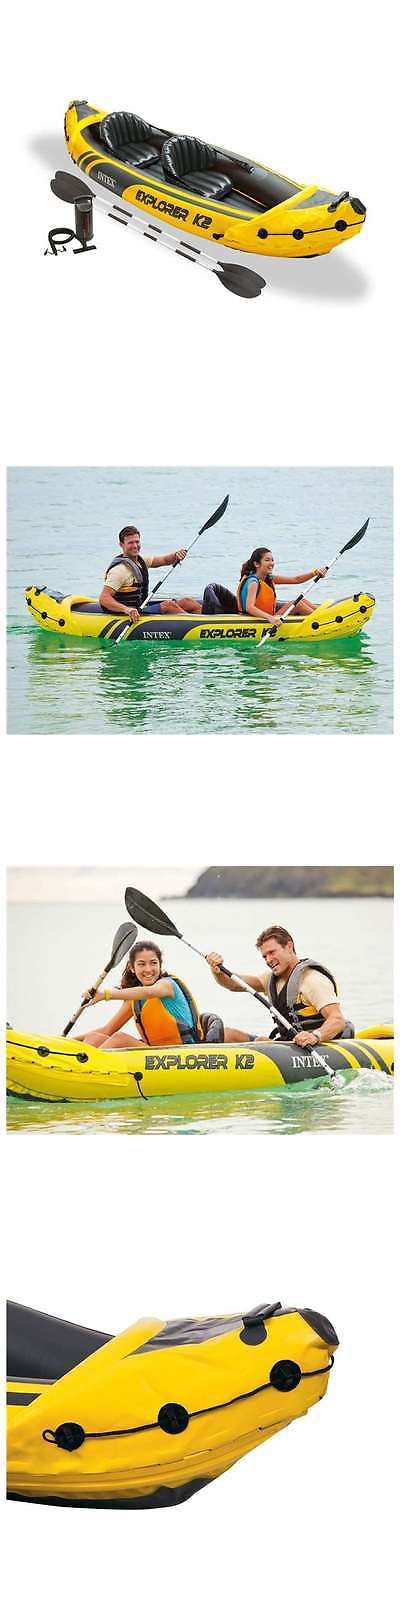 Kayaks 36122: Intex Explorer K2 2-Person Inflatable Kayak Set 68307Ep -> BUY IT NOW ONLY: $79 on eBay!